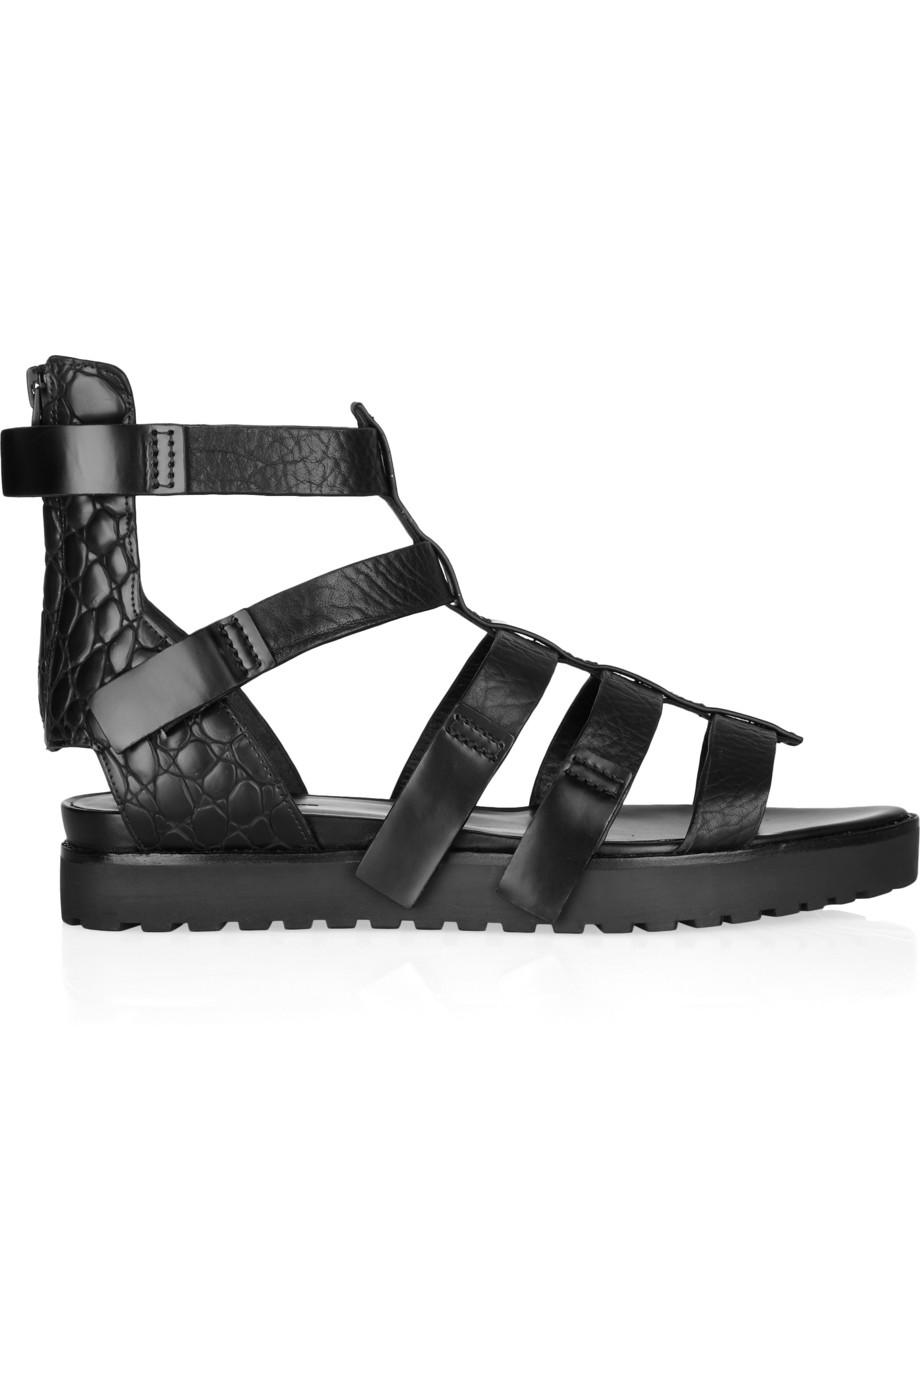 c2ad4675476 Lyst - Alexander Wang Saskia Leather Gladiator Sandals in Black